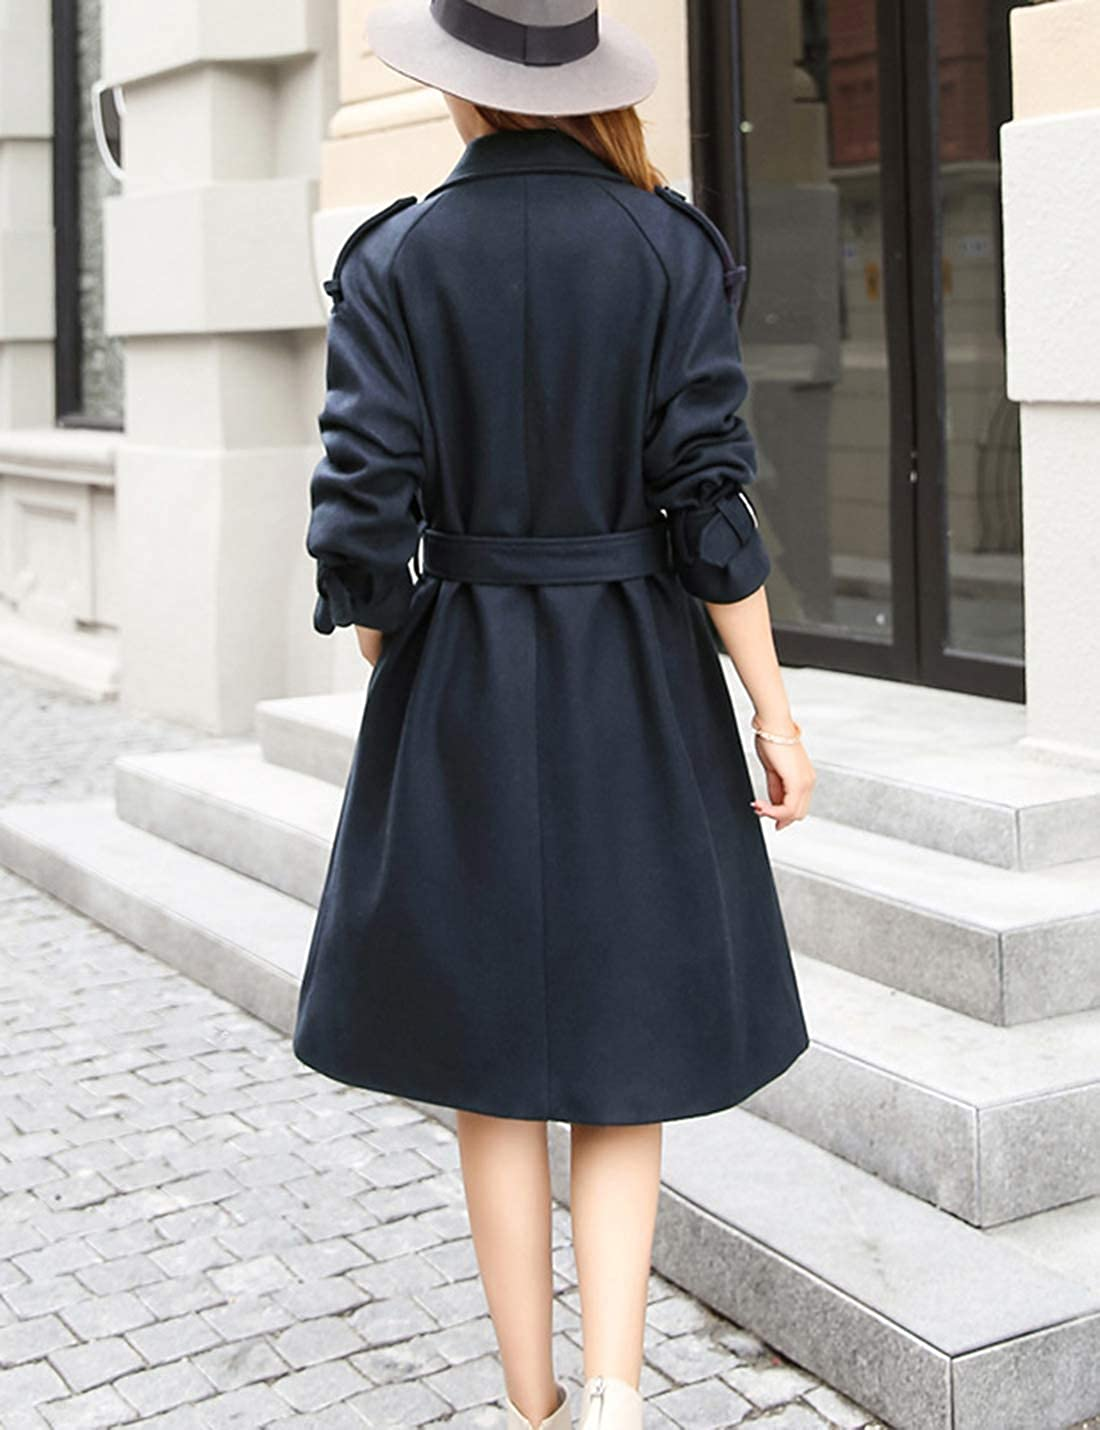 Uaneo Womens Classic Fashion Lapel Wool Blend Thick Coat Long Warm Overcoat